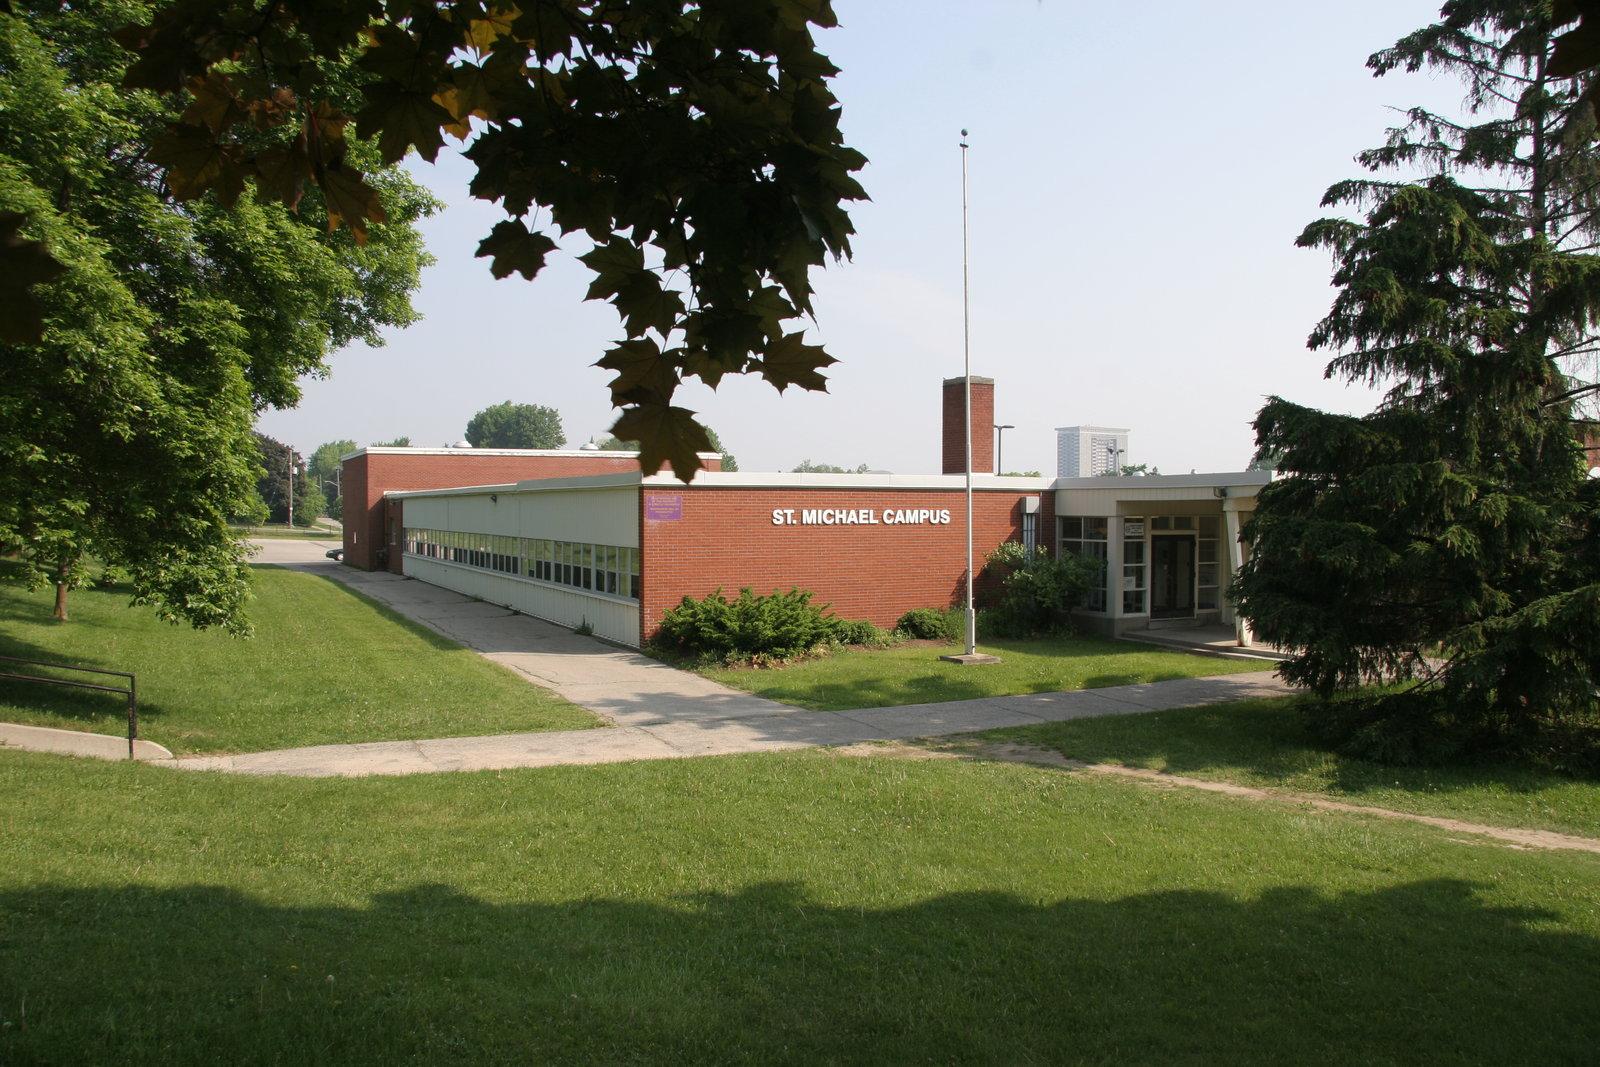 St. Michael campus, Wilfrid Laurier University, 2007